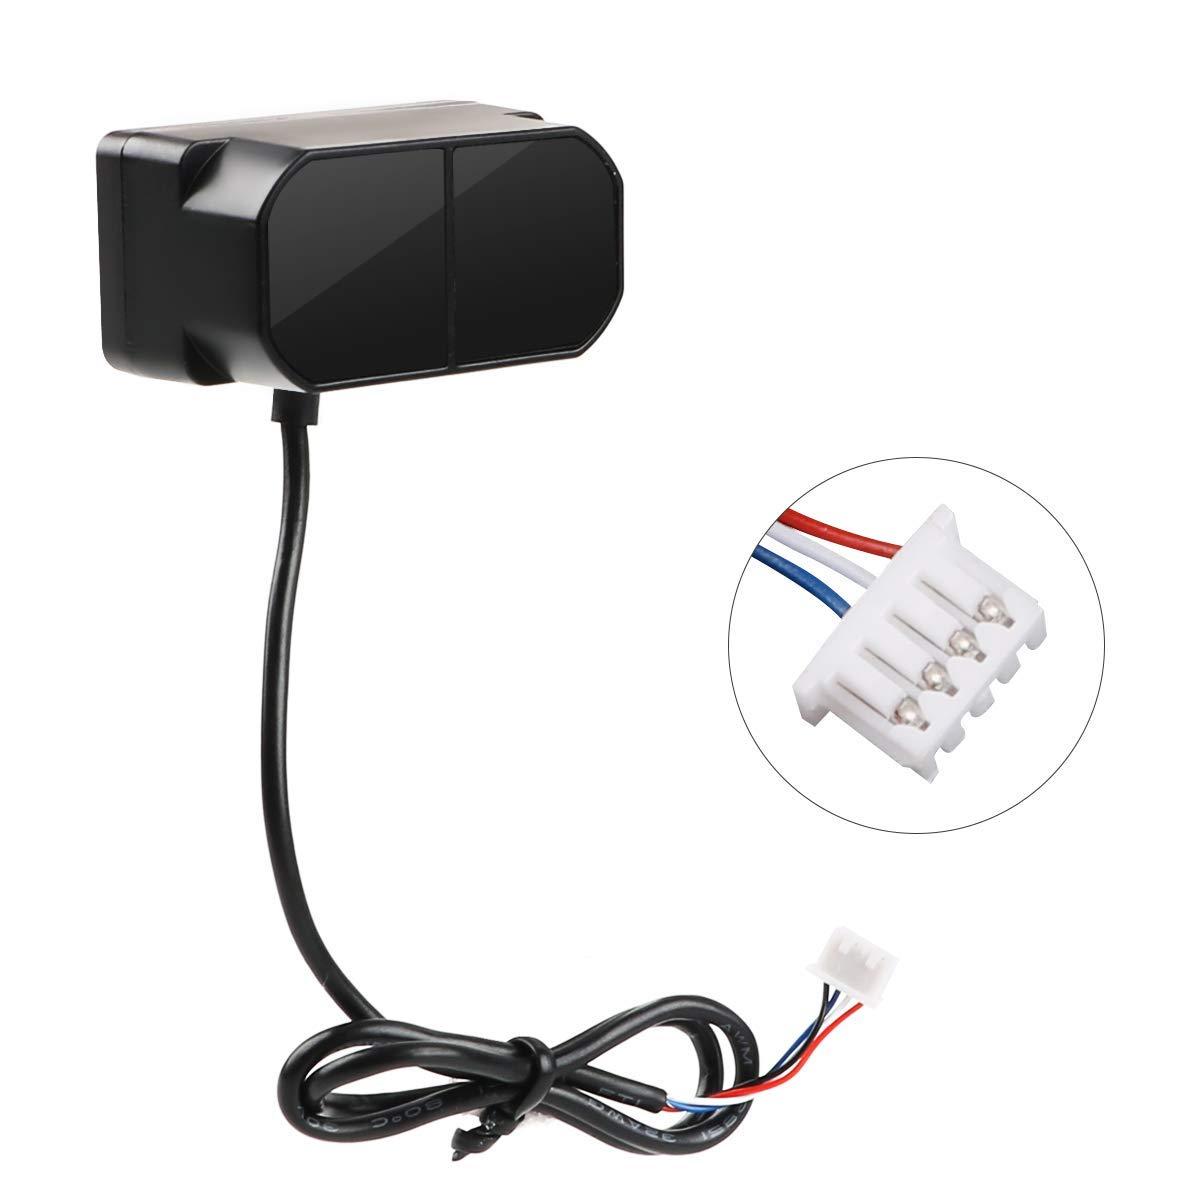 TFmini Plus Lidar Module, 0.1-12m Indoors Measurement Range, Low Cost Waterproof Dustproof Short-Range Distance Sensor, Single-Point Micro UART for Drone Industrial Sensing Robot Smart Home